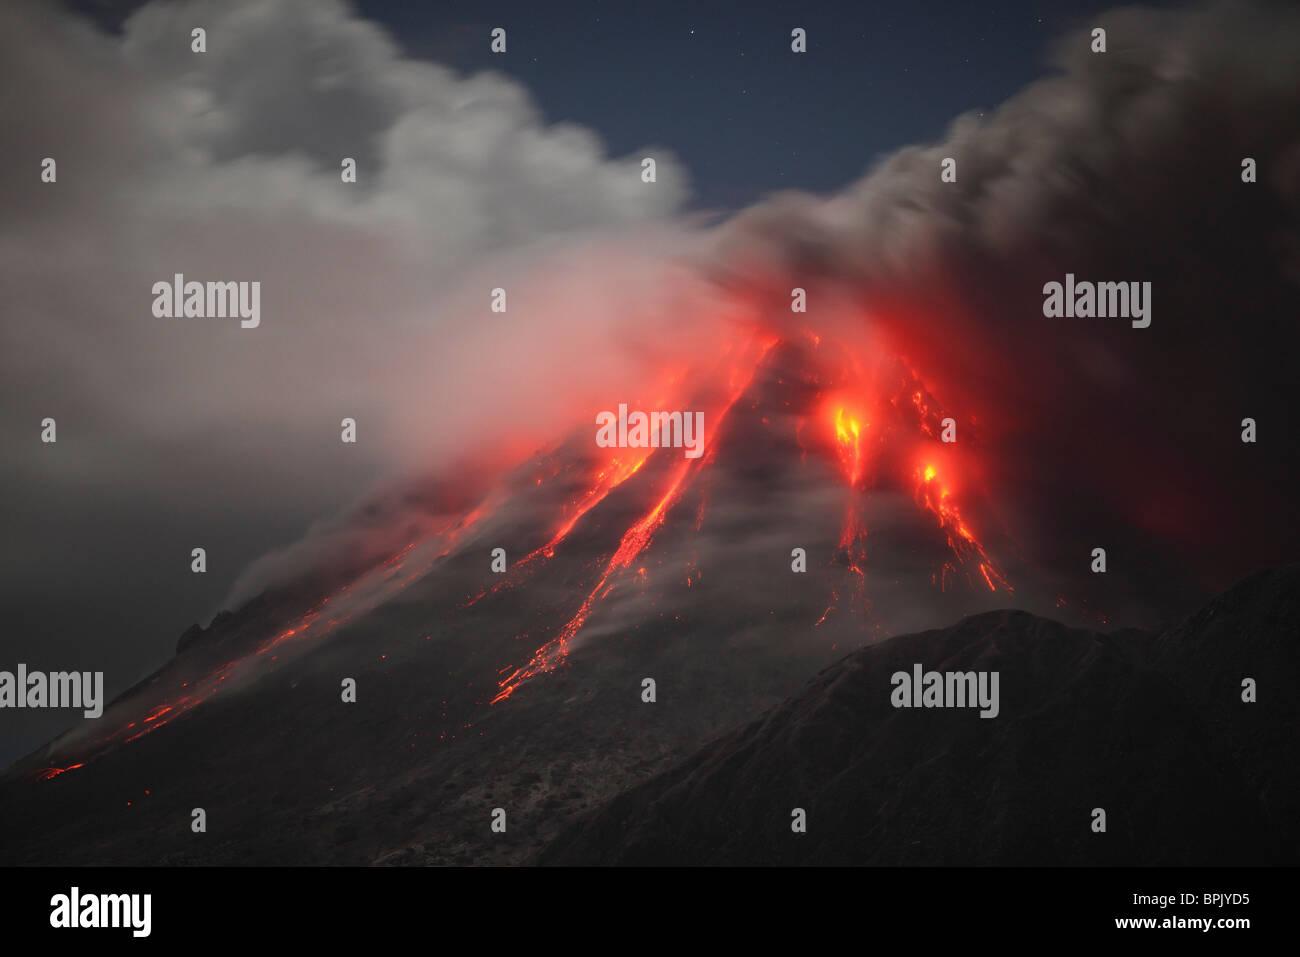 February 1, 2010 - Soufriere Hills eruption, Montserrat Island, Caribbean. - Stock Image